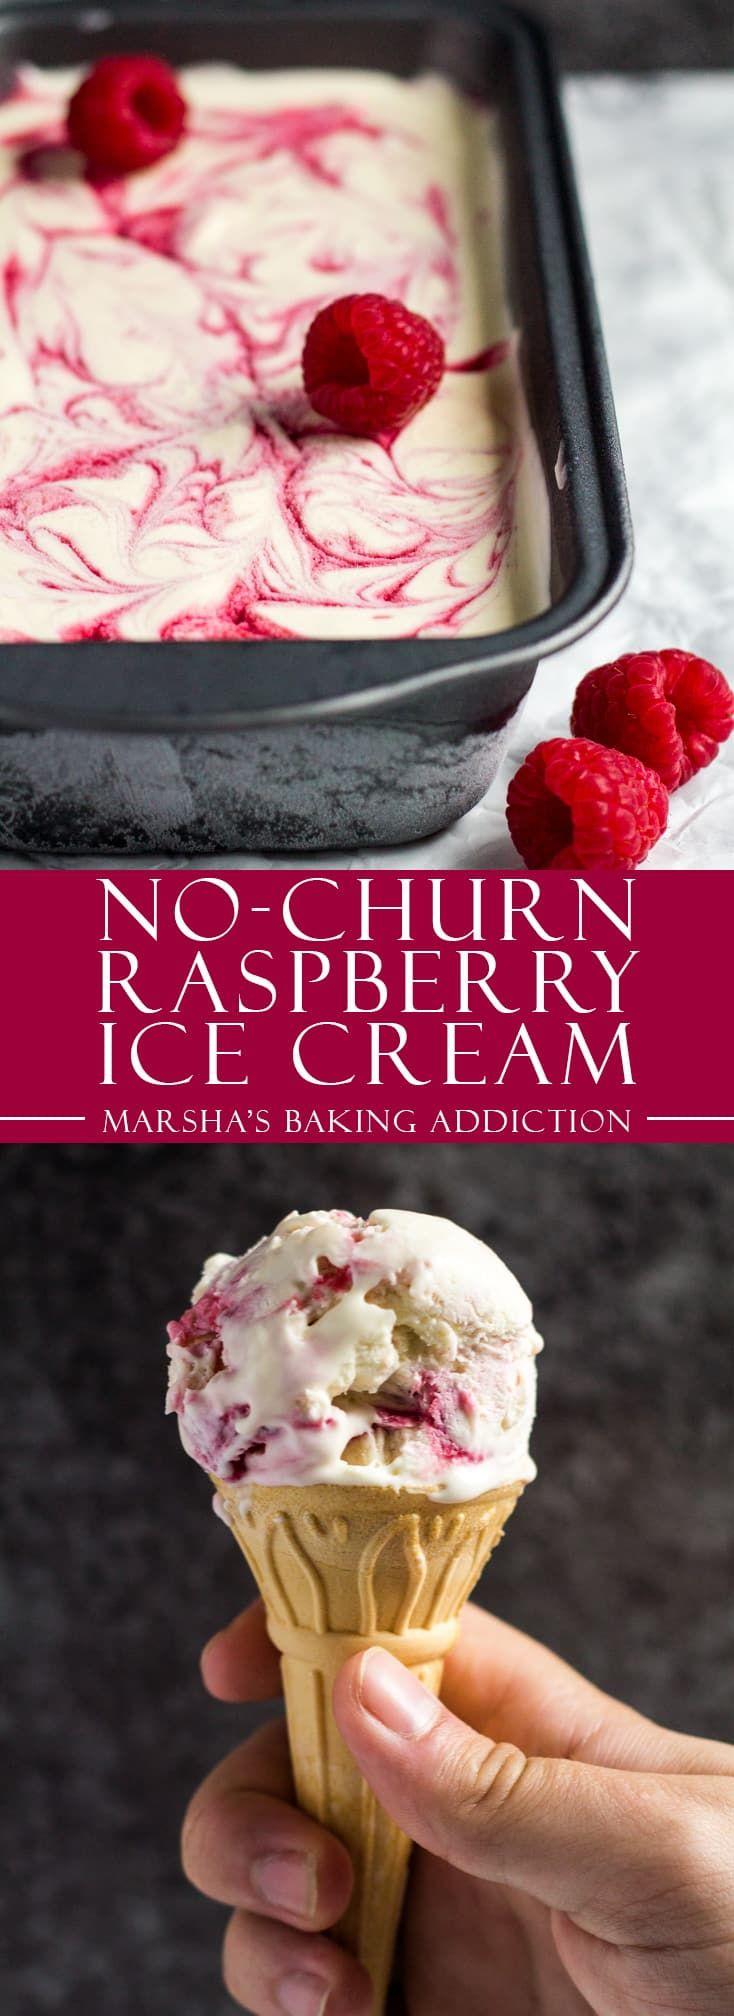 No-Churn Raspberry Ripple Ice Cream   marshasbakingaddiction.com @marshasbakeblog